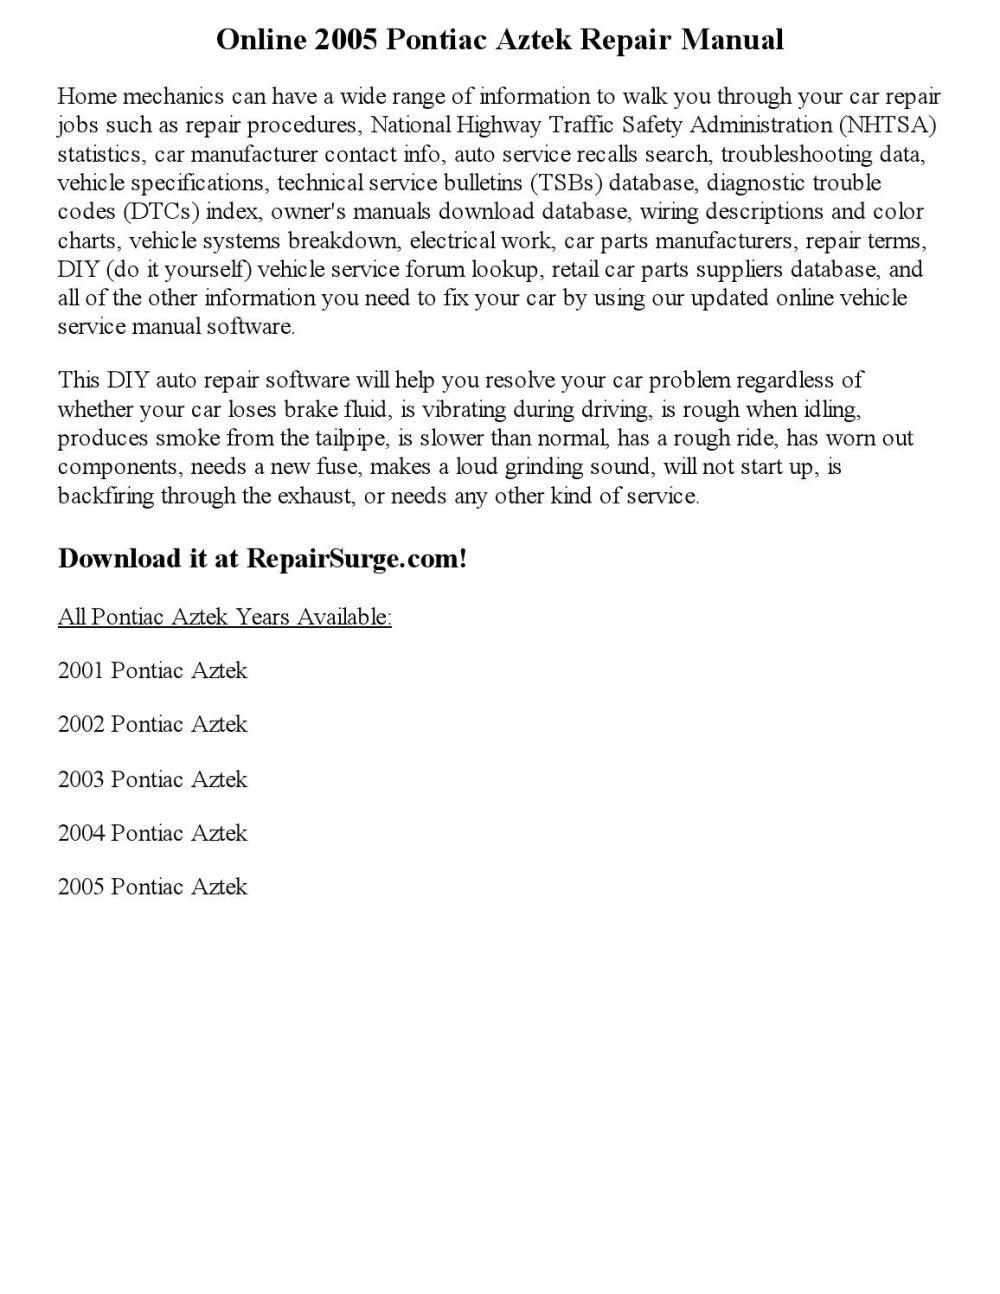 medium resolution of 2005 pontiac aztek repair manual online